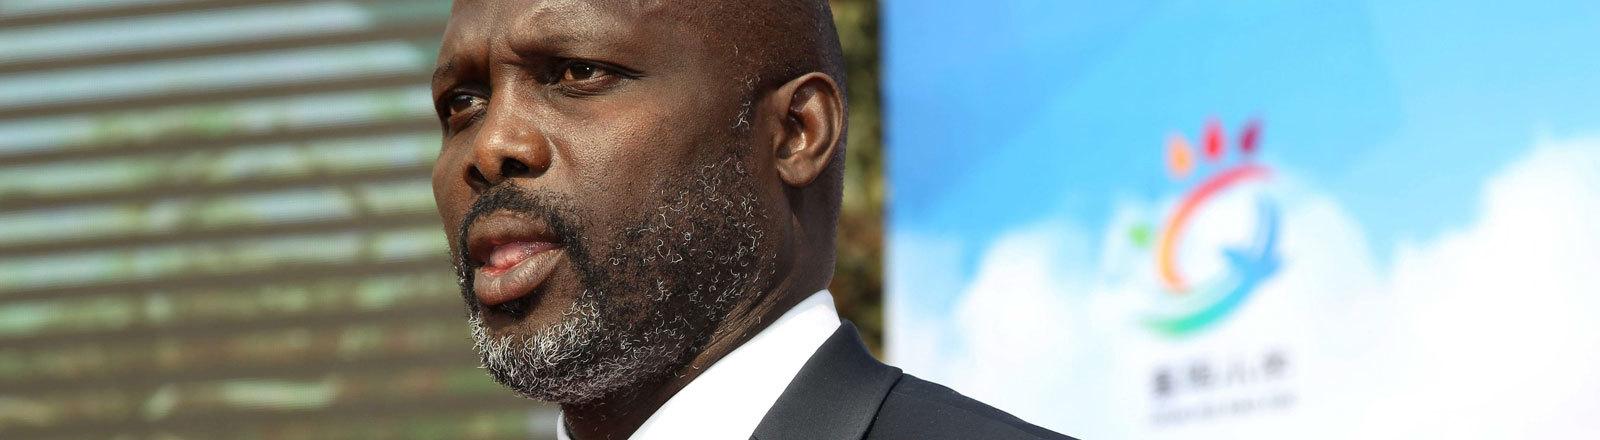 George Weah Präsidentschaftskandidat in Liberia